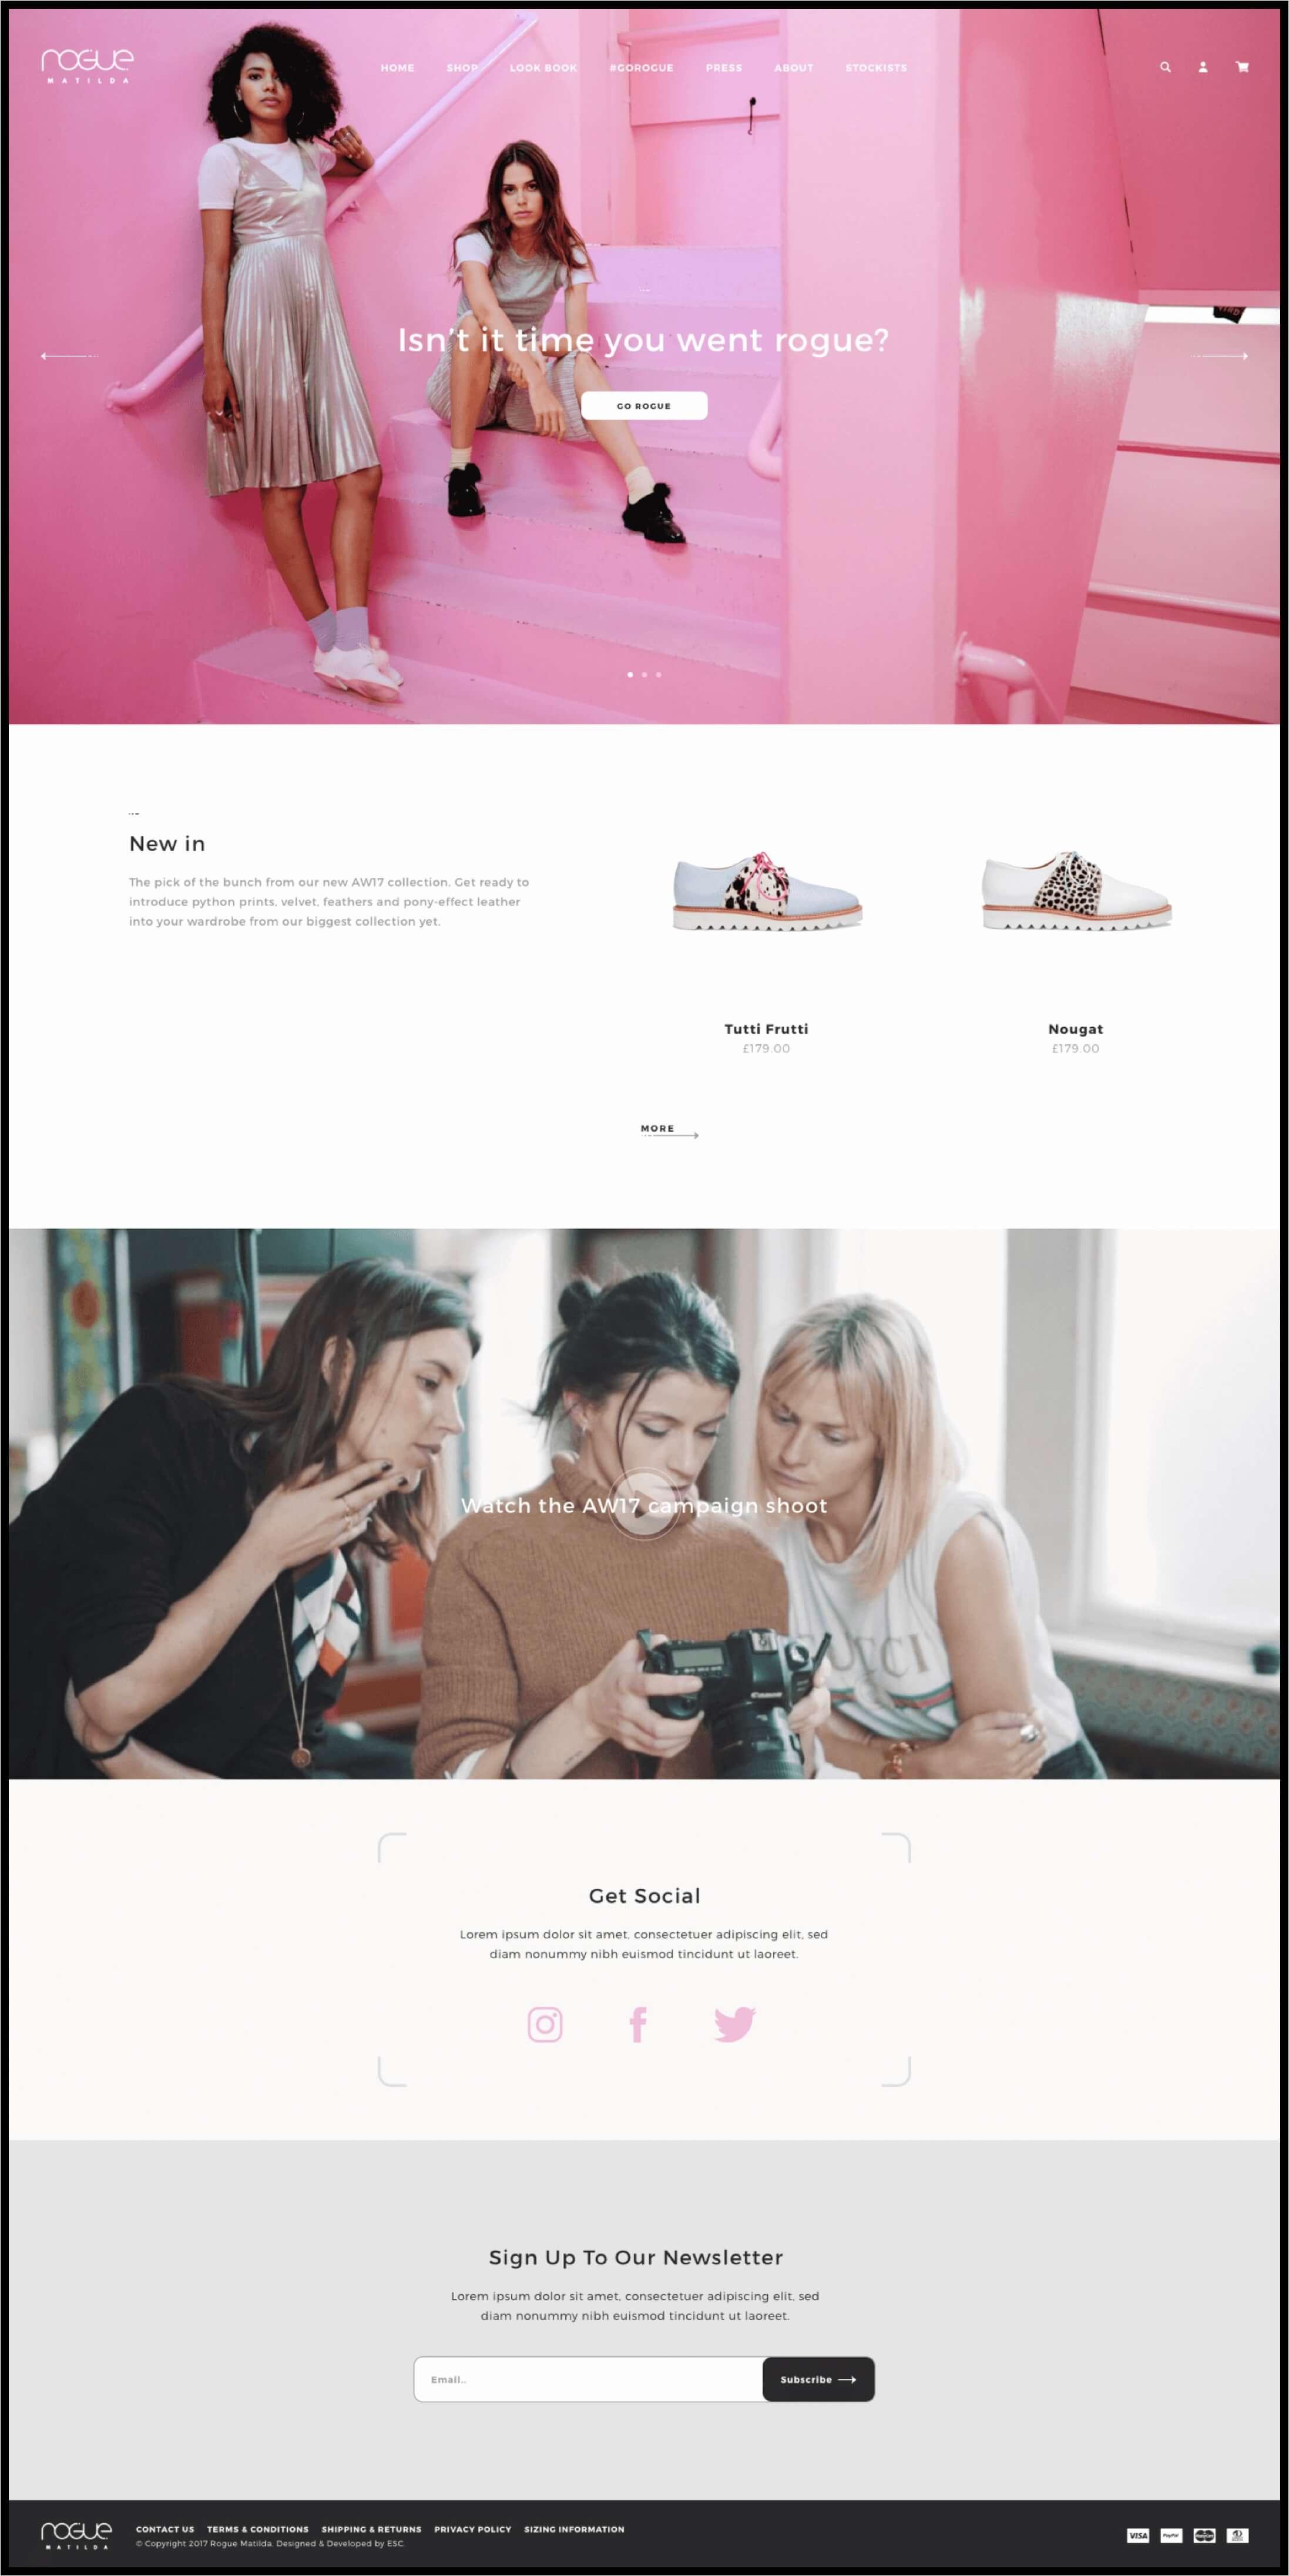 Rogue Matilda Shopify Home Page